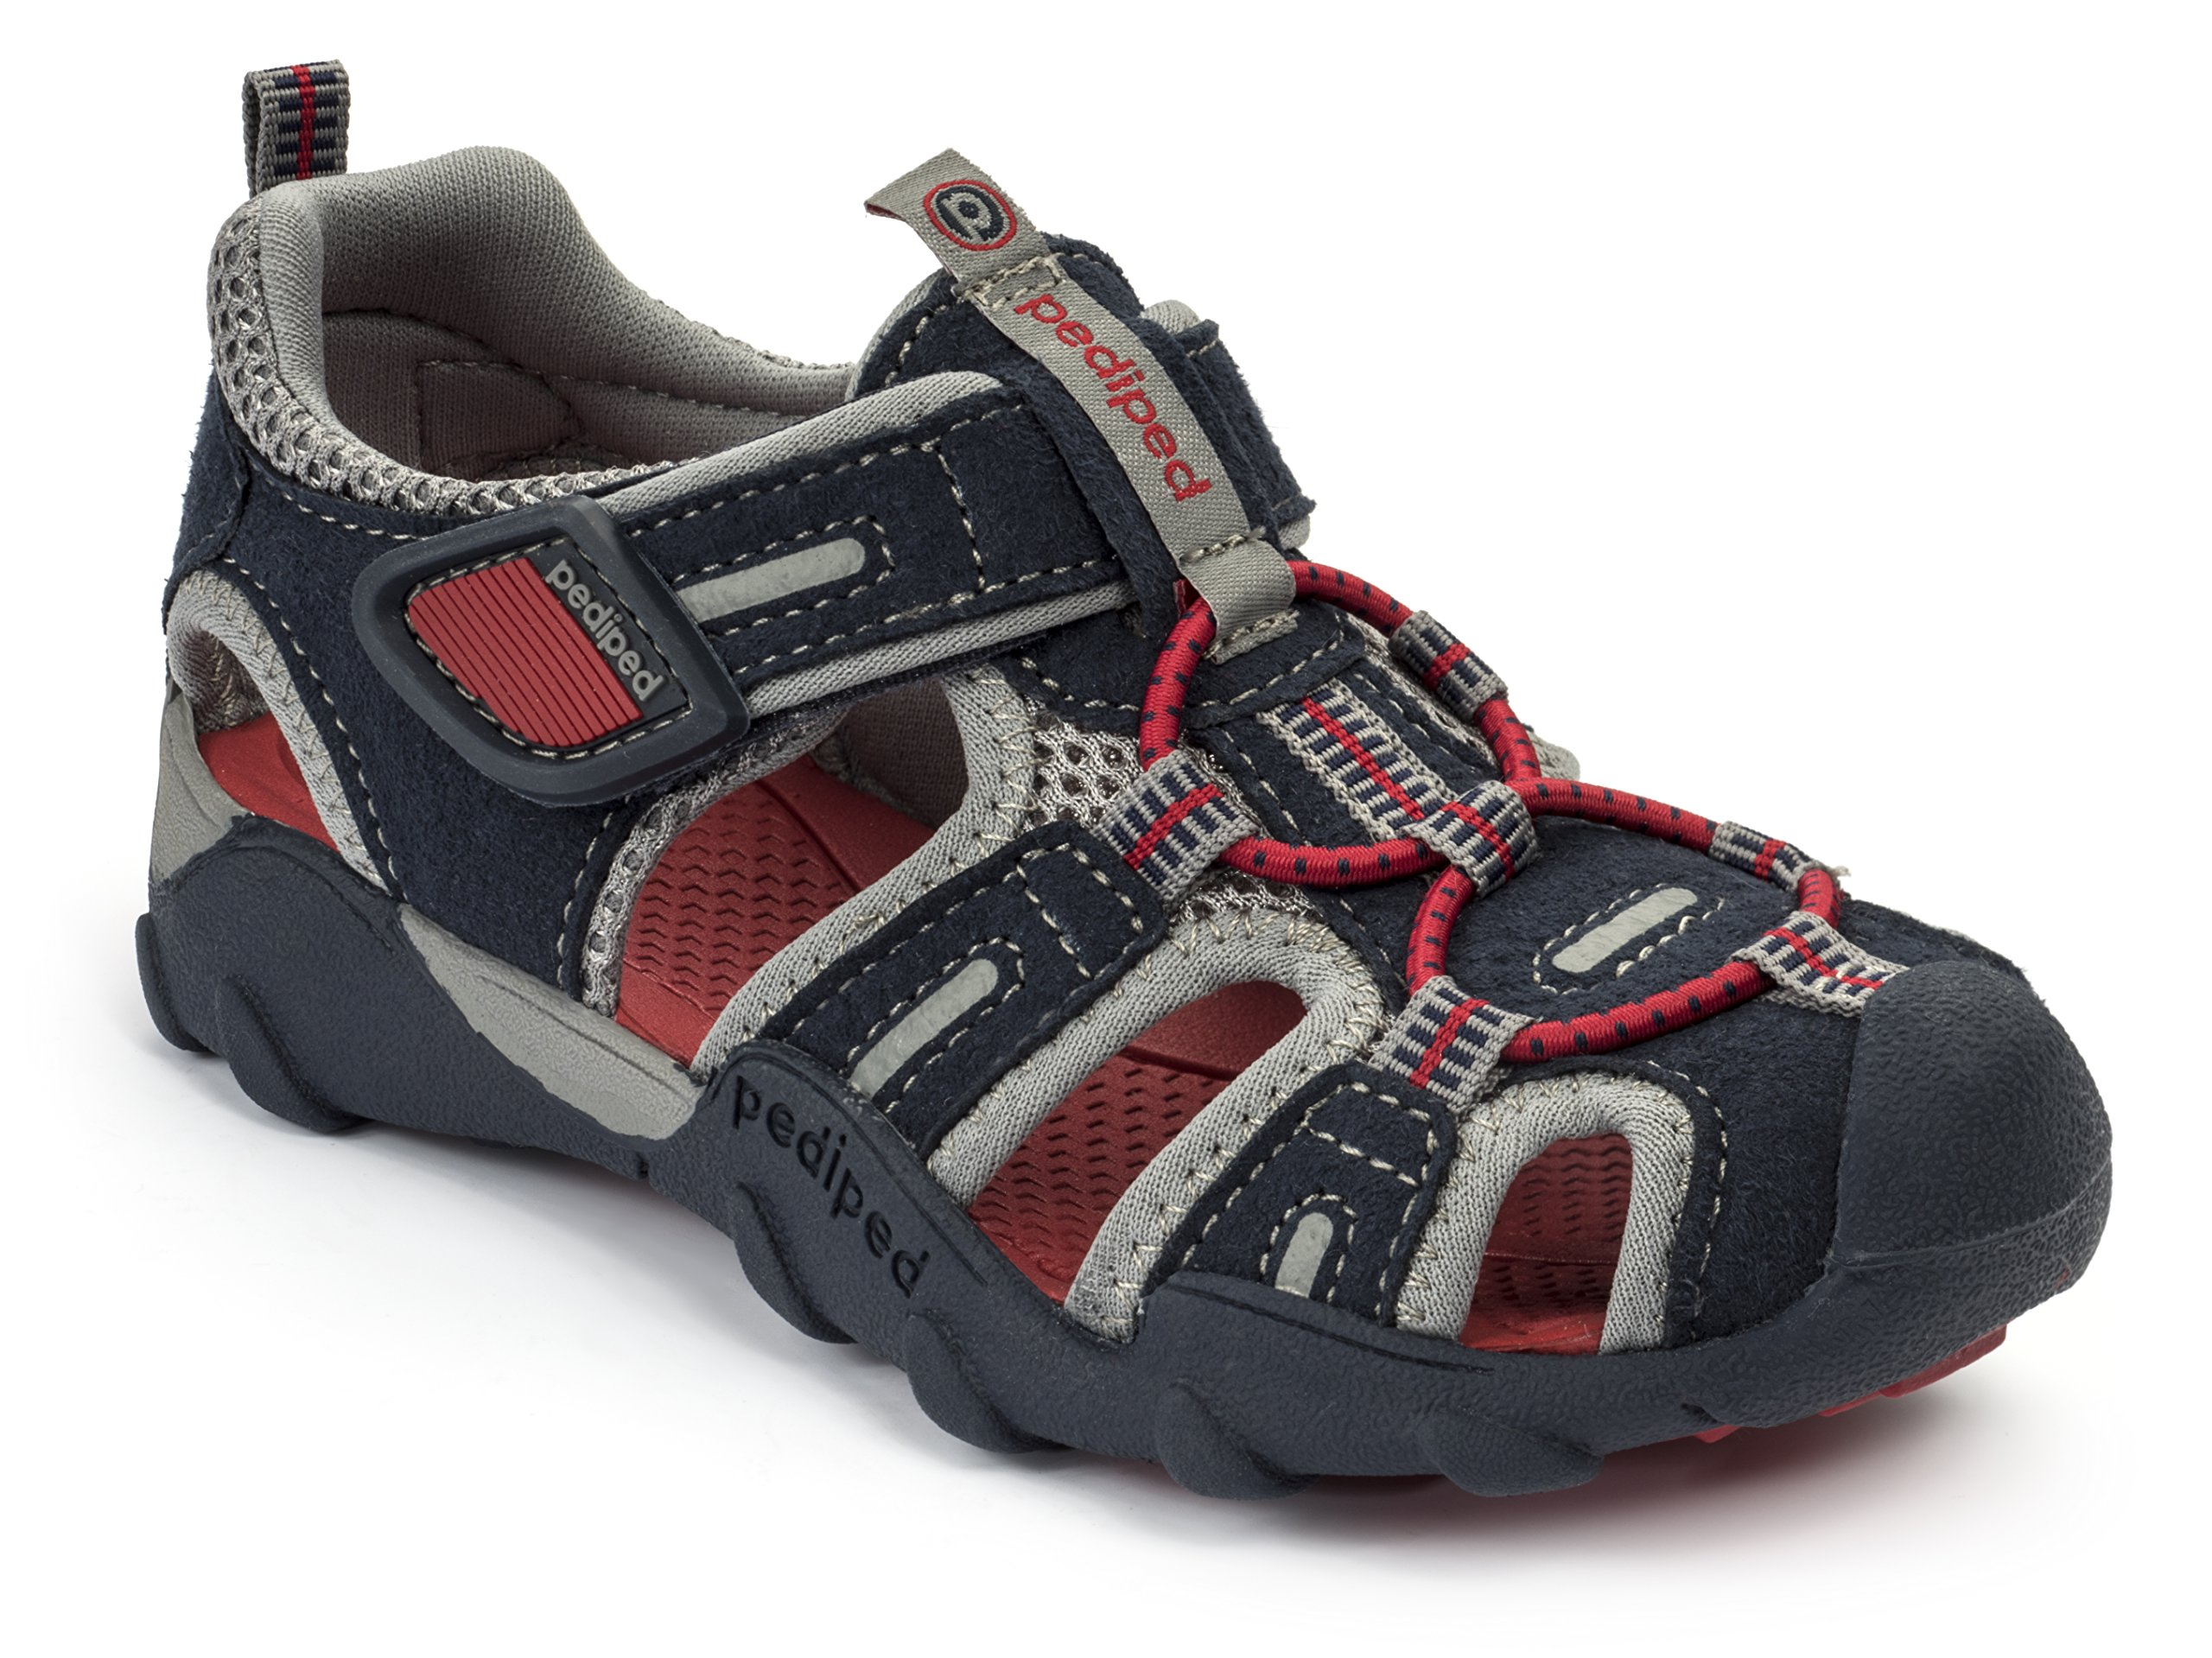 pediped Flex Canyon Water Sandal (Toddler/Little Kid/Big Kid), Navy/Red, 32 EU(1 E US Little Kid)